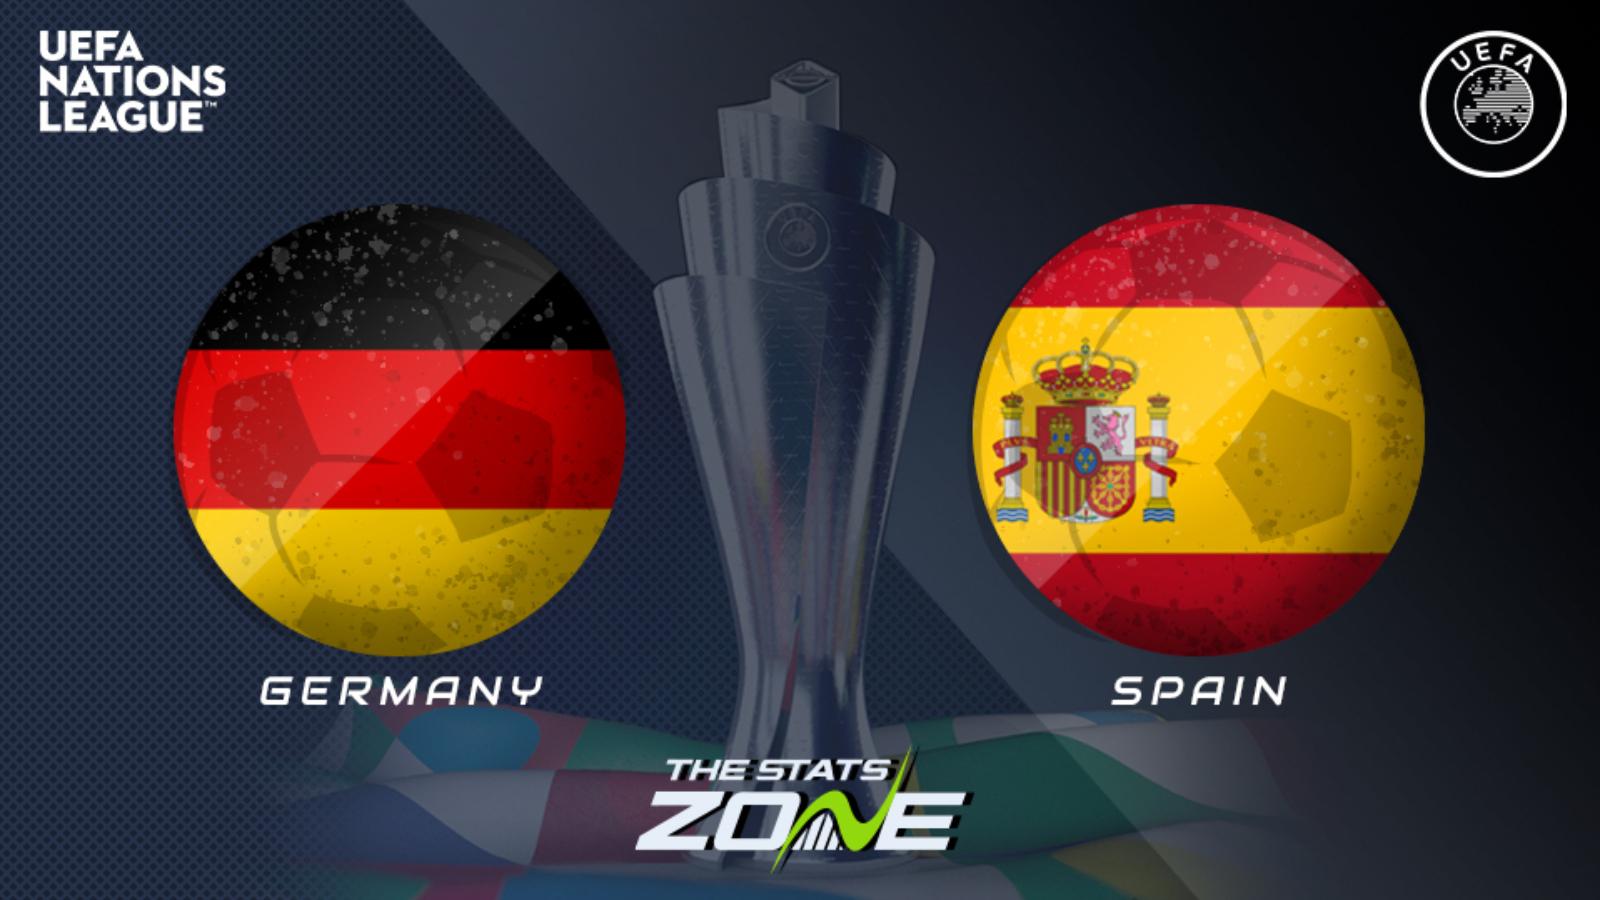 Uefa Nations League 2021/21